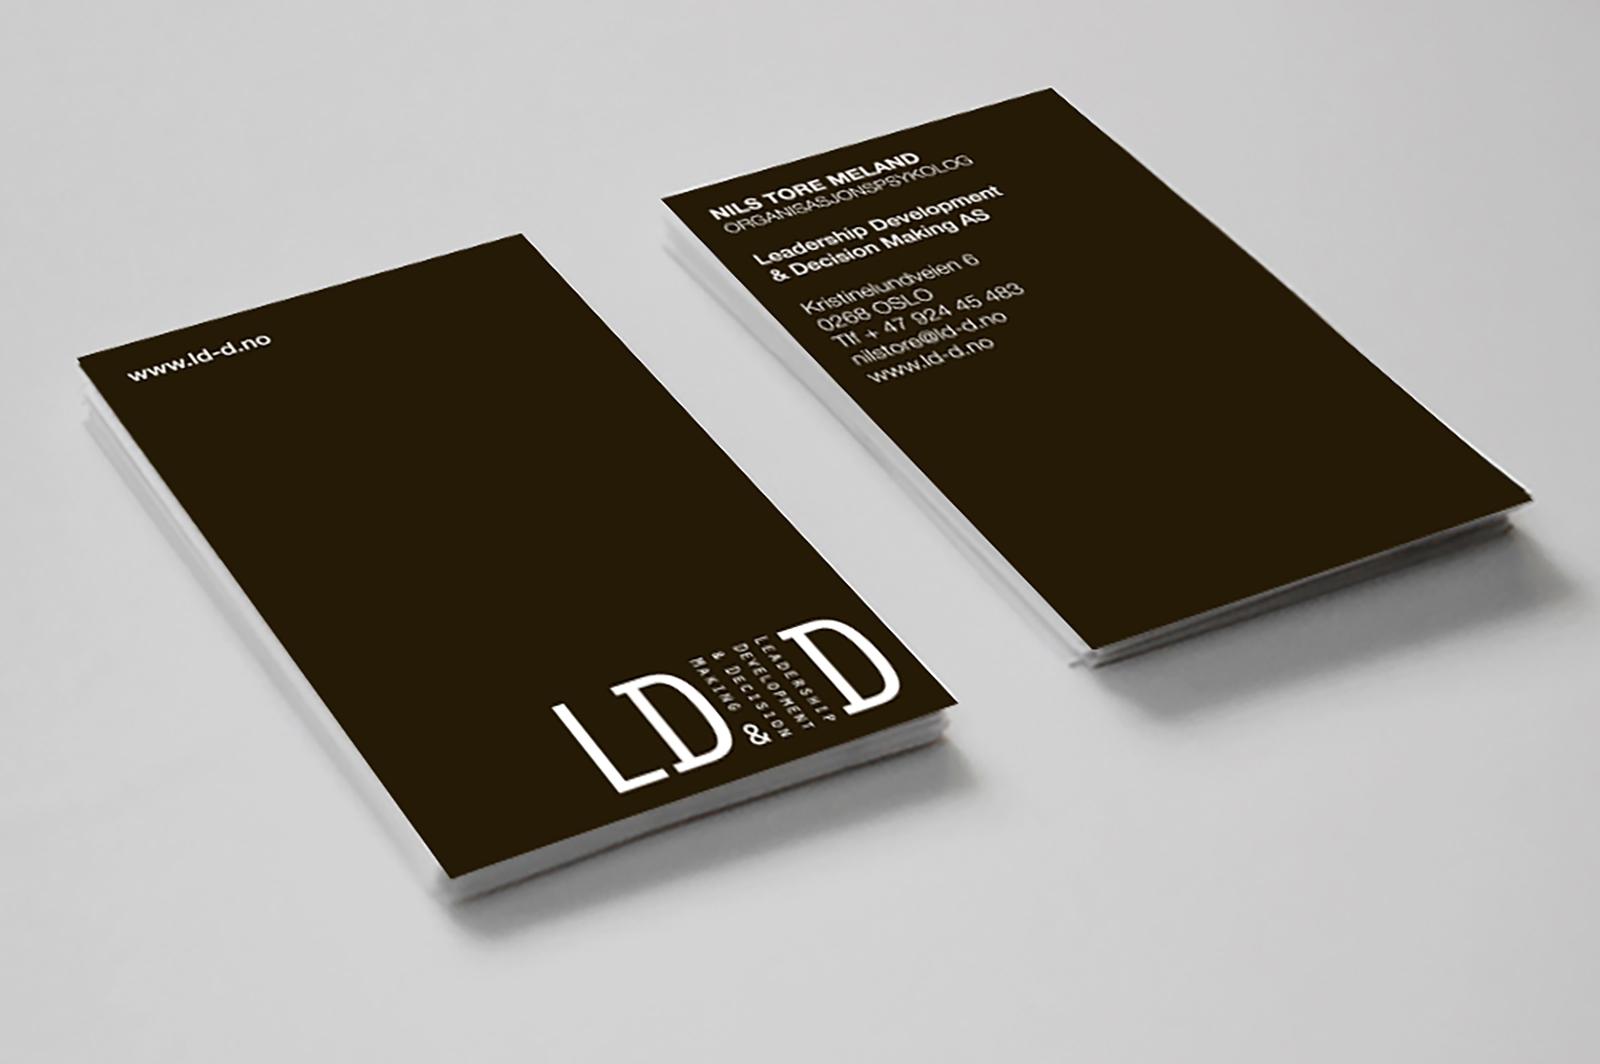 LD&D - Visittkort